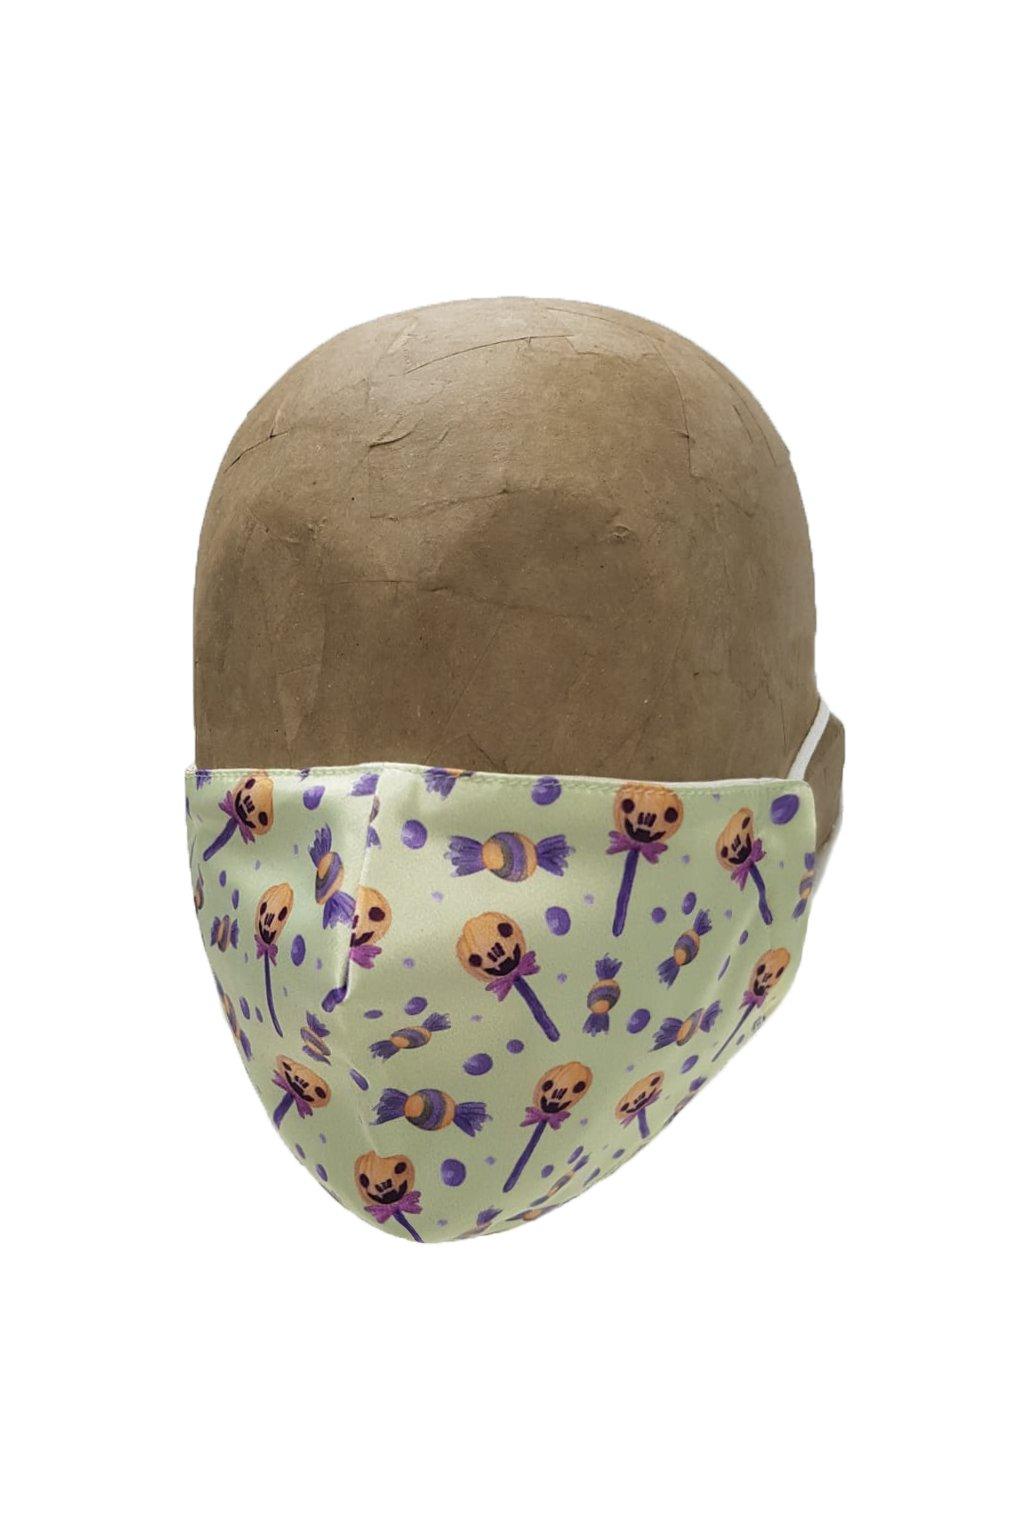 Rúško PUMPKIN LOLLIPOP s iómi striebra UNISEX A